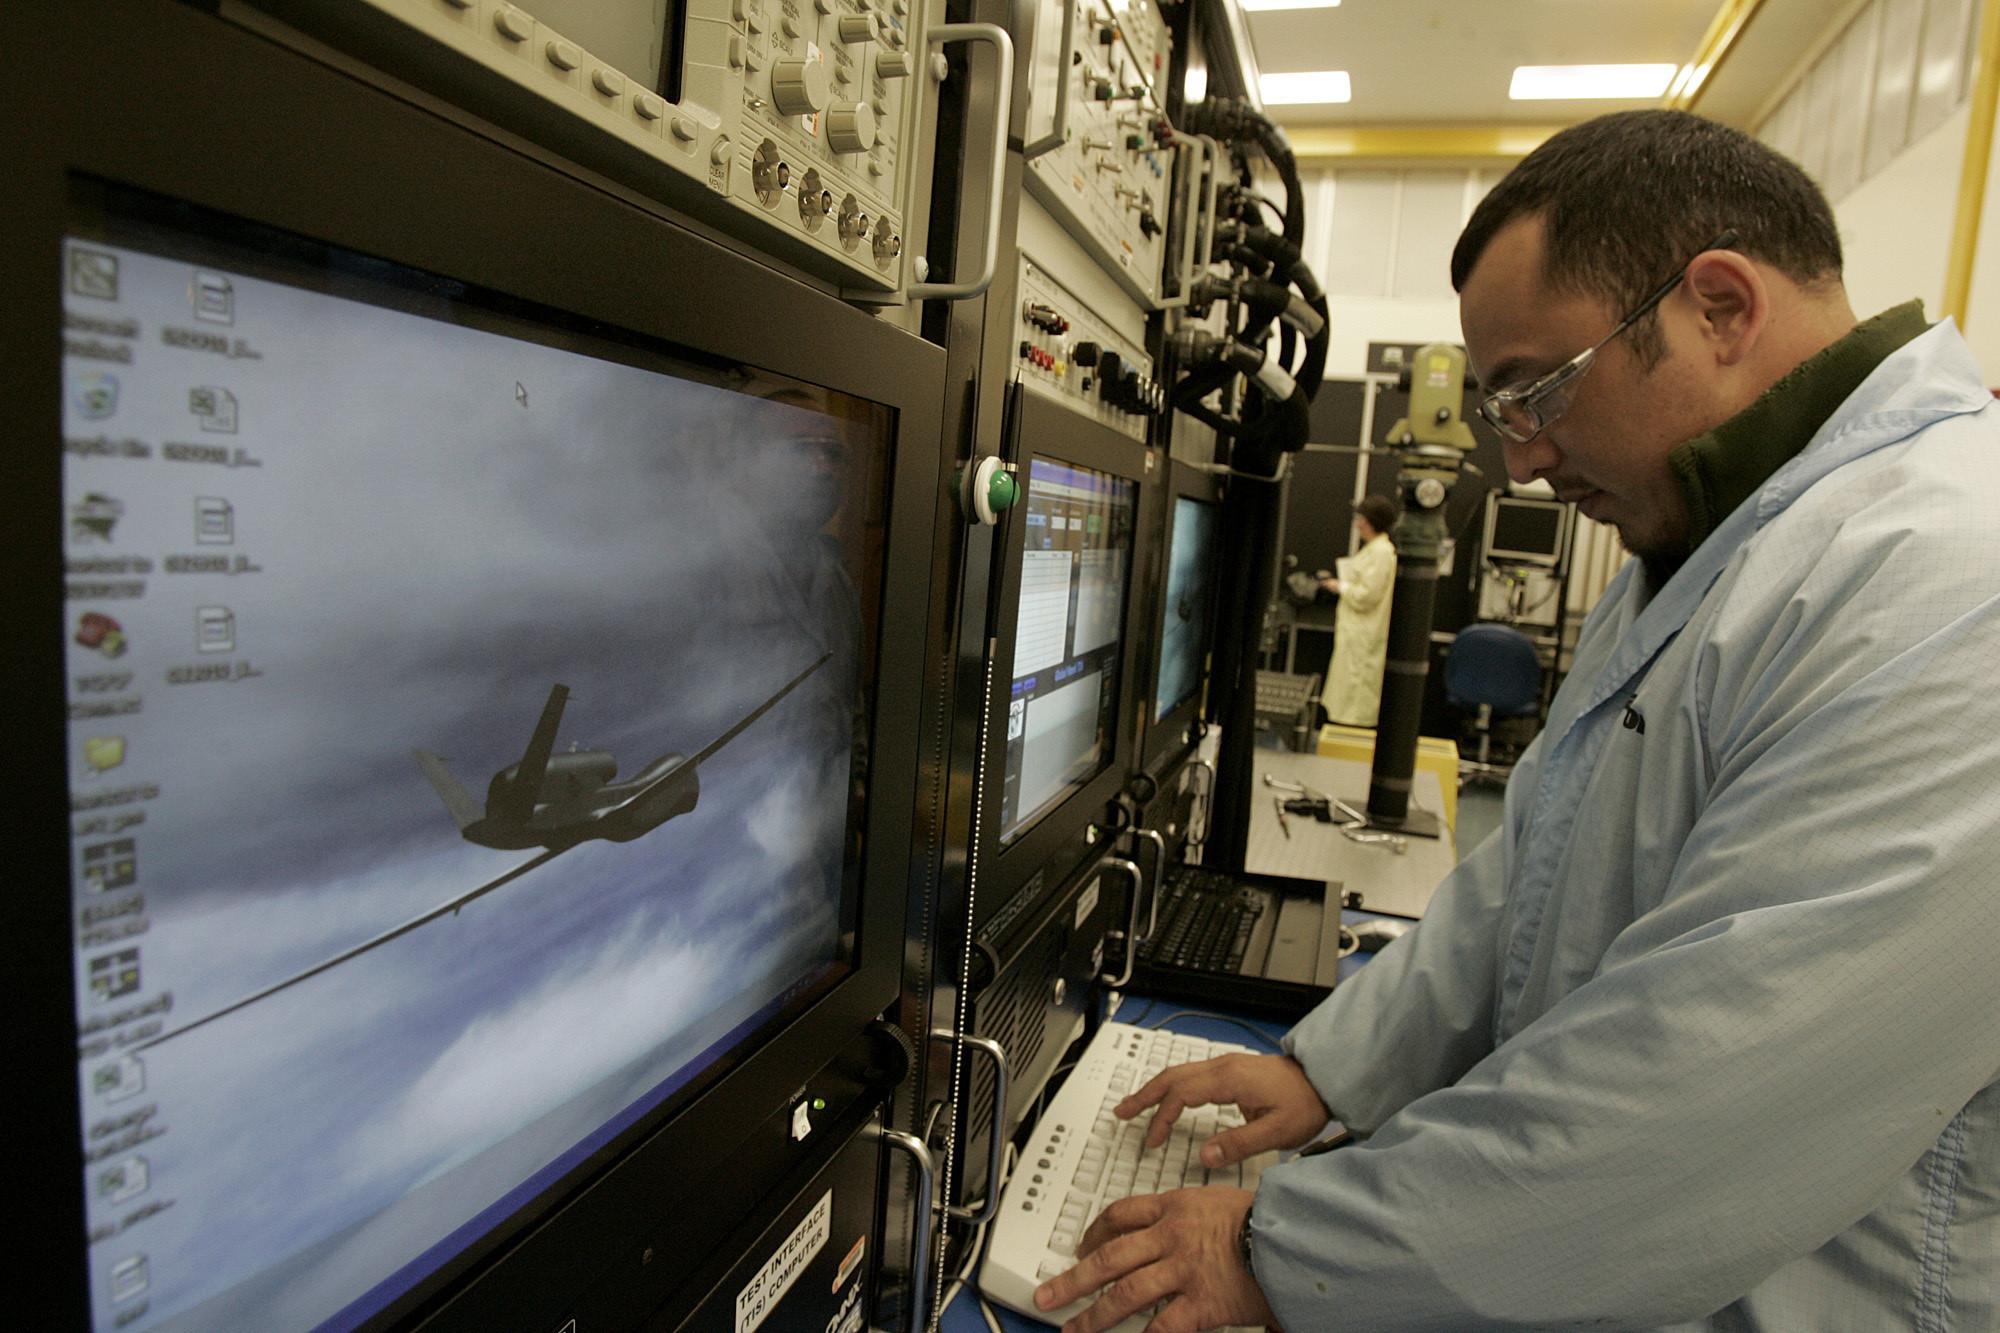 Raytheon to move 250 jobs from Chula Vista, Norfolk, Va. - LA Times